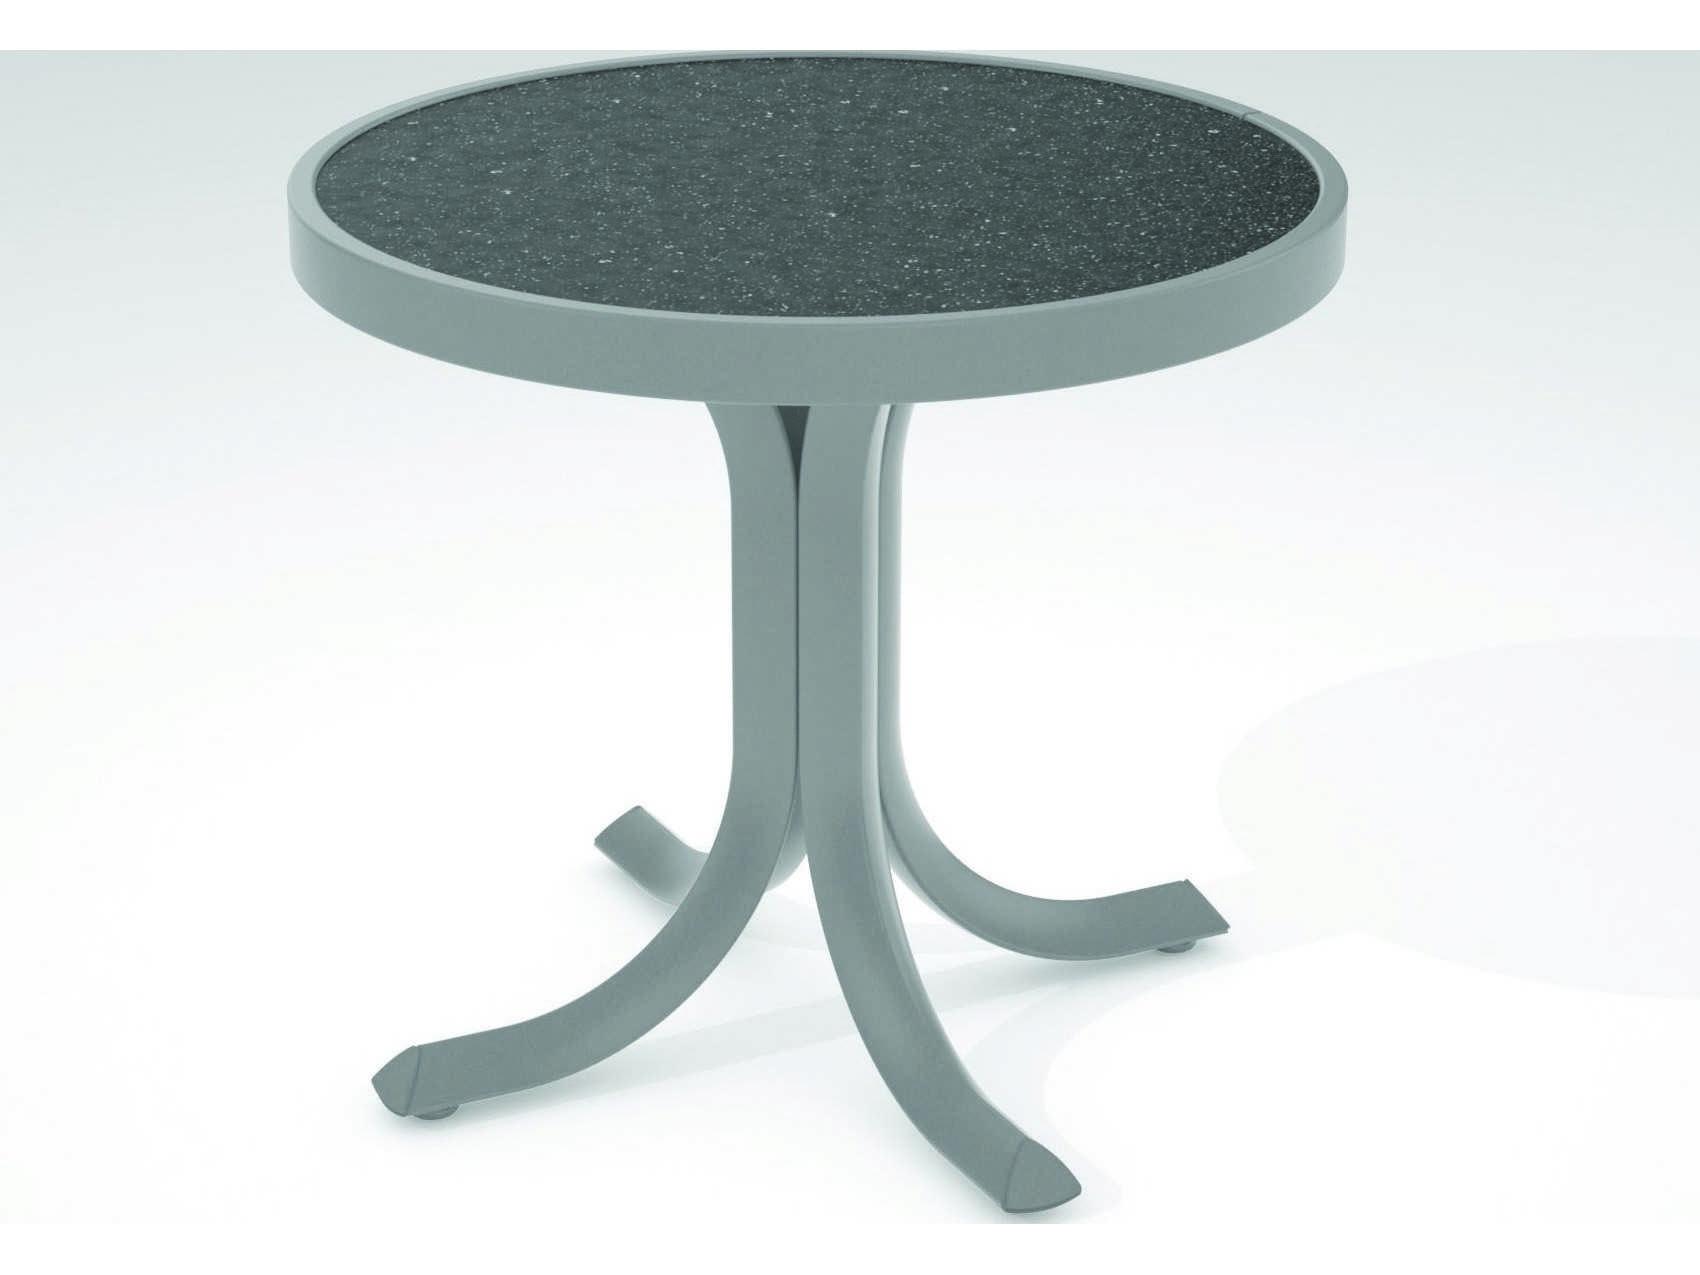 Tropitone Hpl Raduno Aluminum 20 Round Tea Table Tp1882h